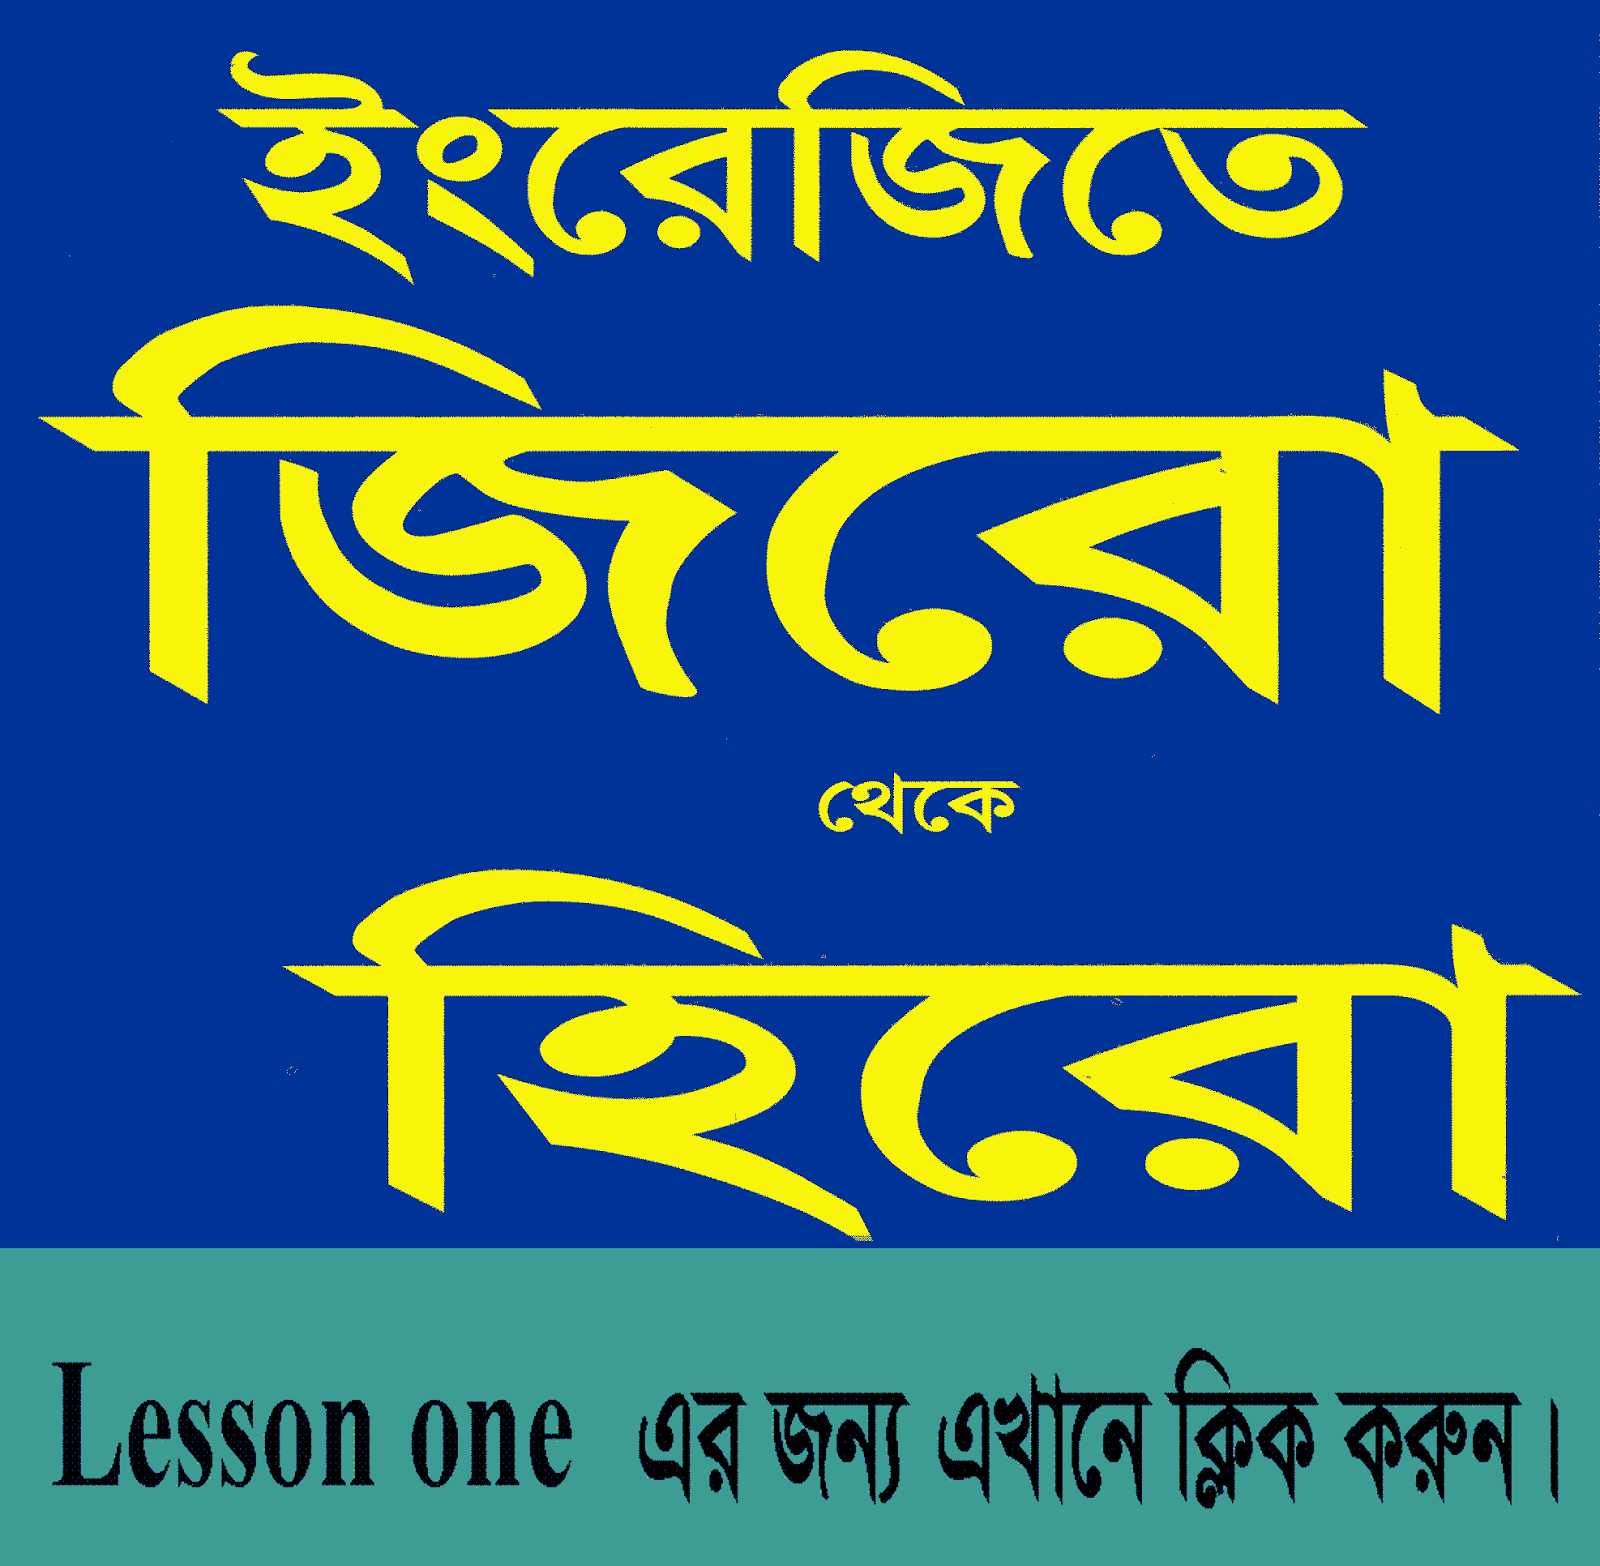 Saifurs English Speaking Book